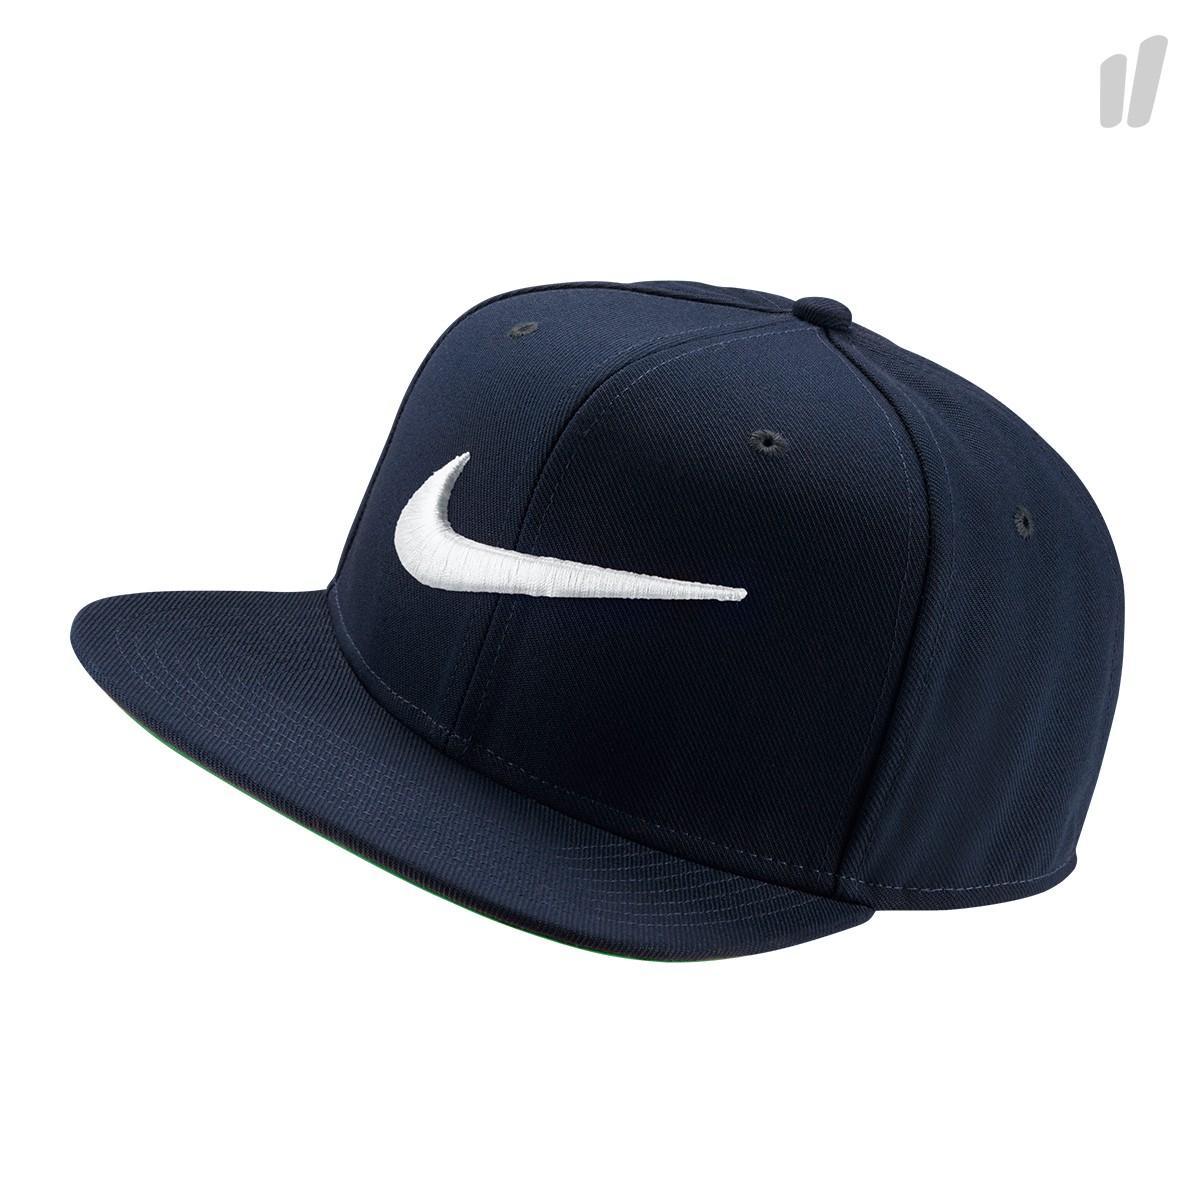 Nike Topi Swoosh Pro classic Cap - 639534-451 - Navy